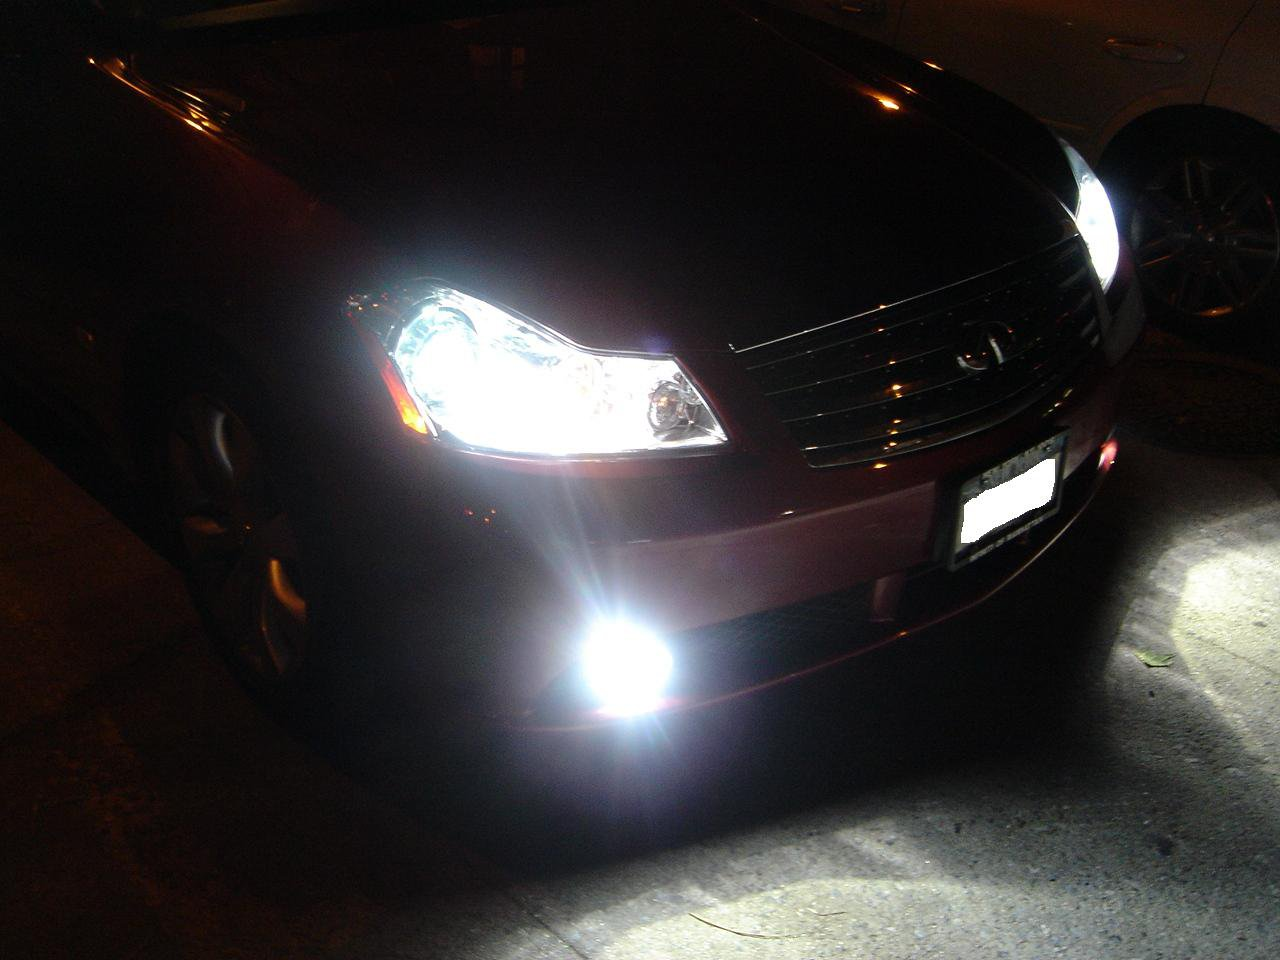 2008 2009 2010 Infiniti M35 M45 Xenon Fog Lights Kit